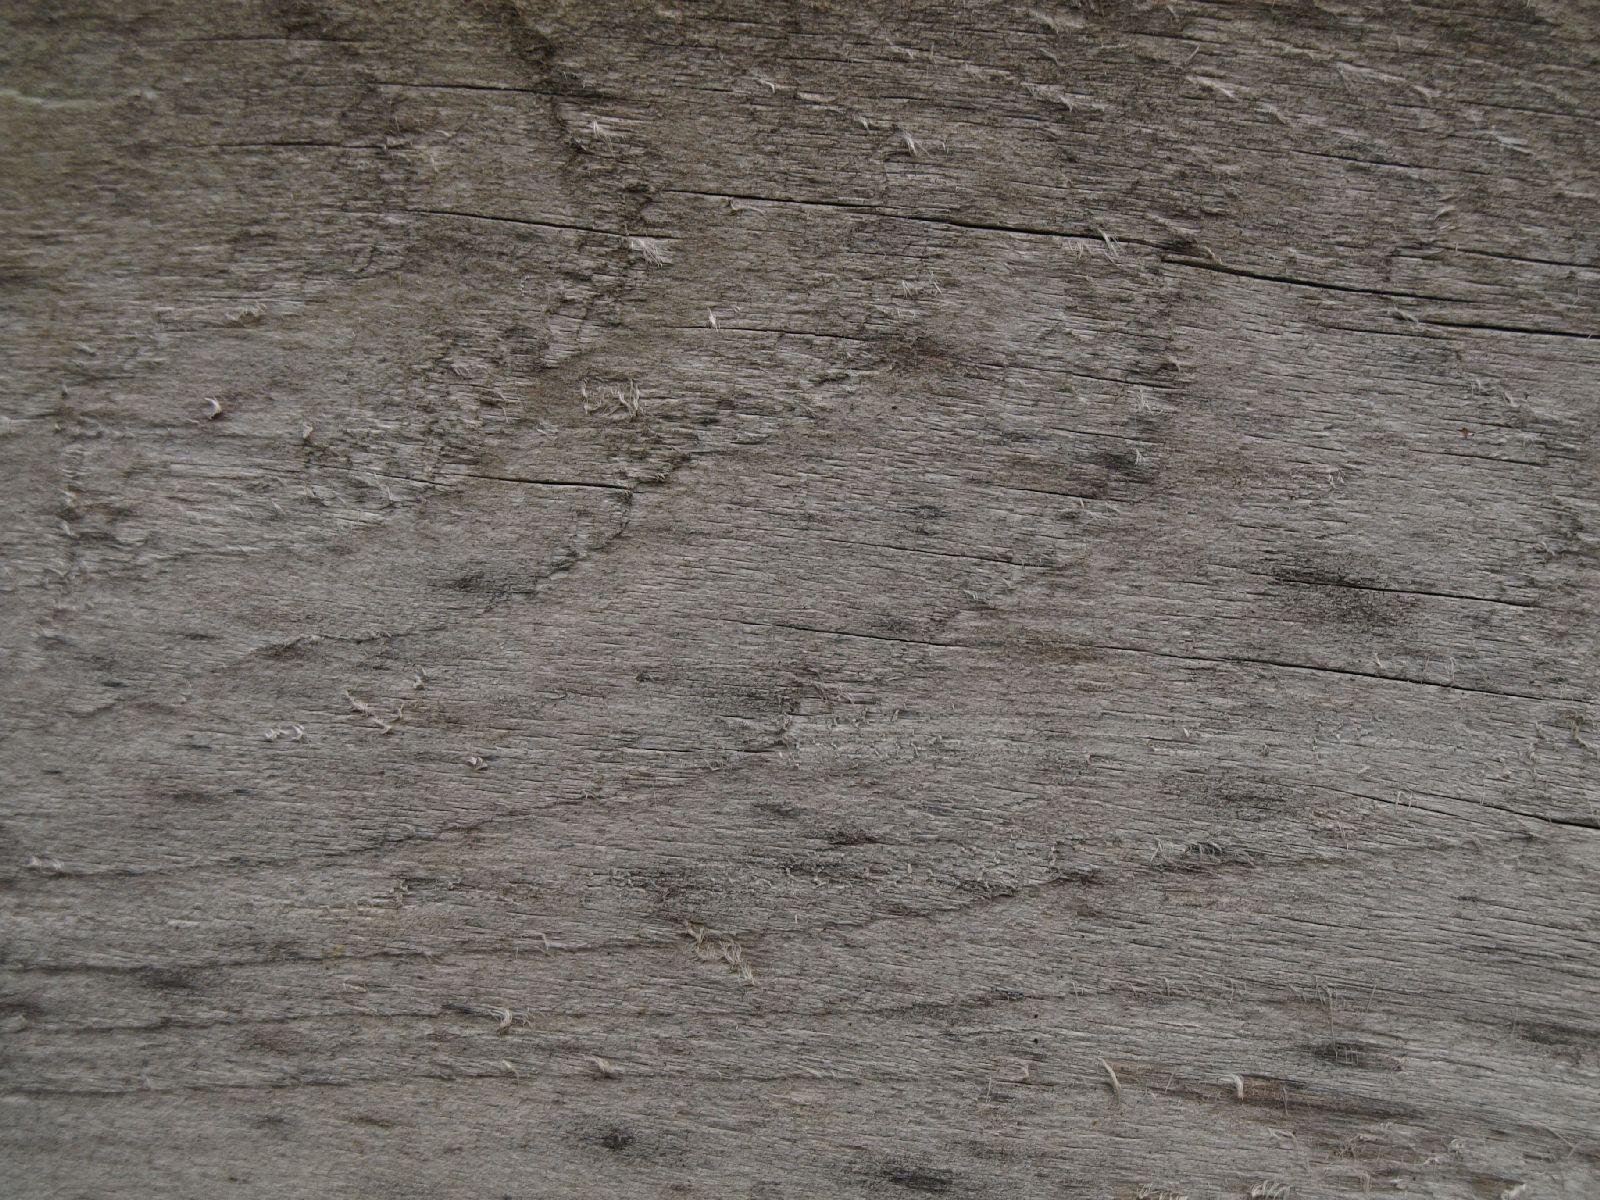 Wood_Texture_A_P1189445